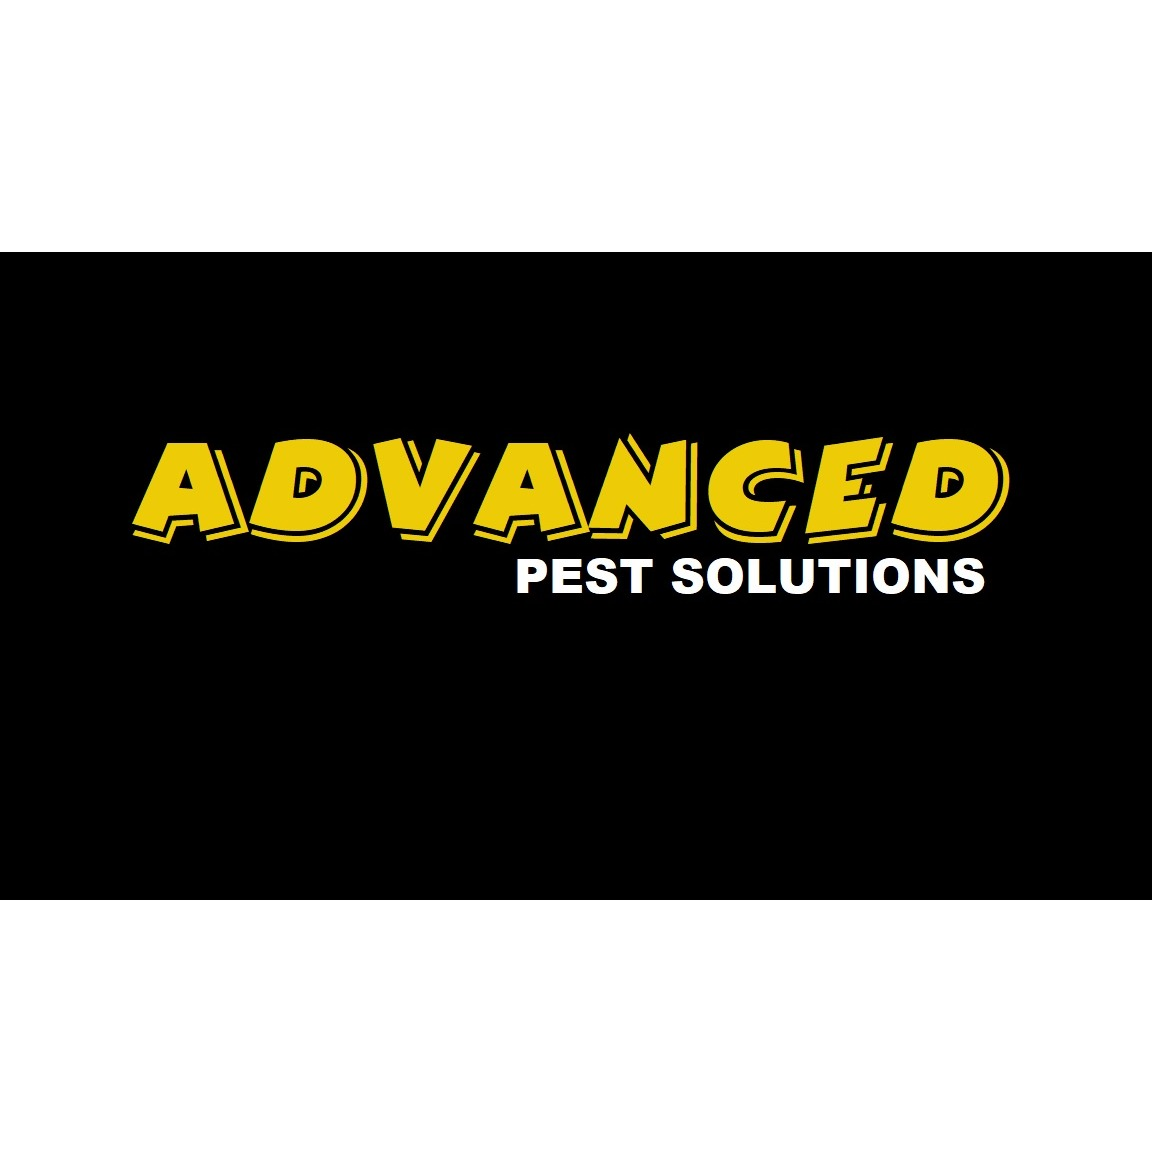 Advanced Pest Solutions